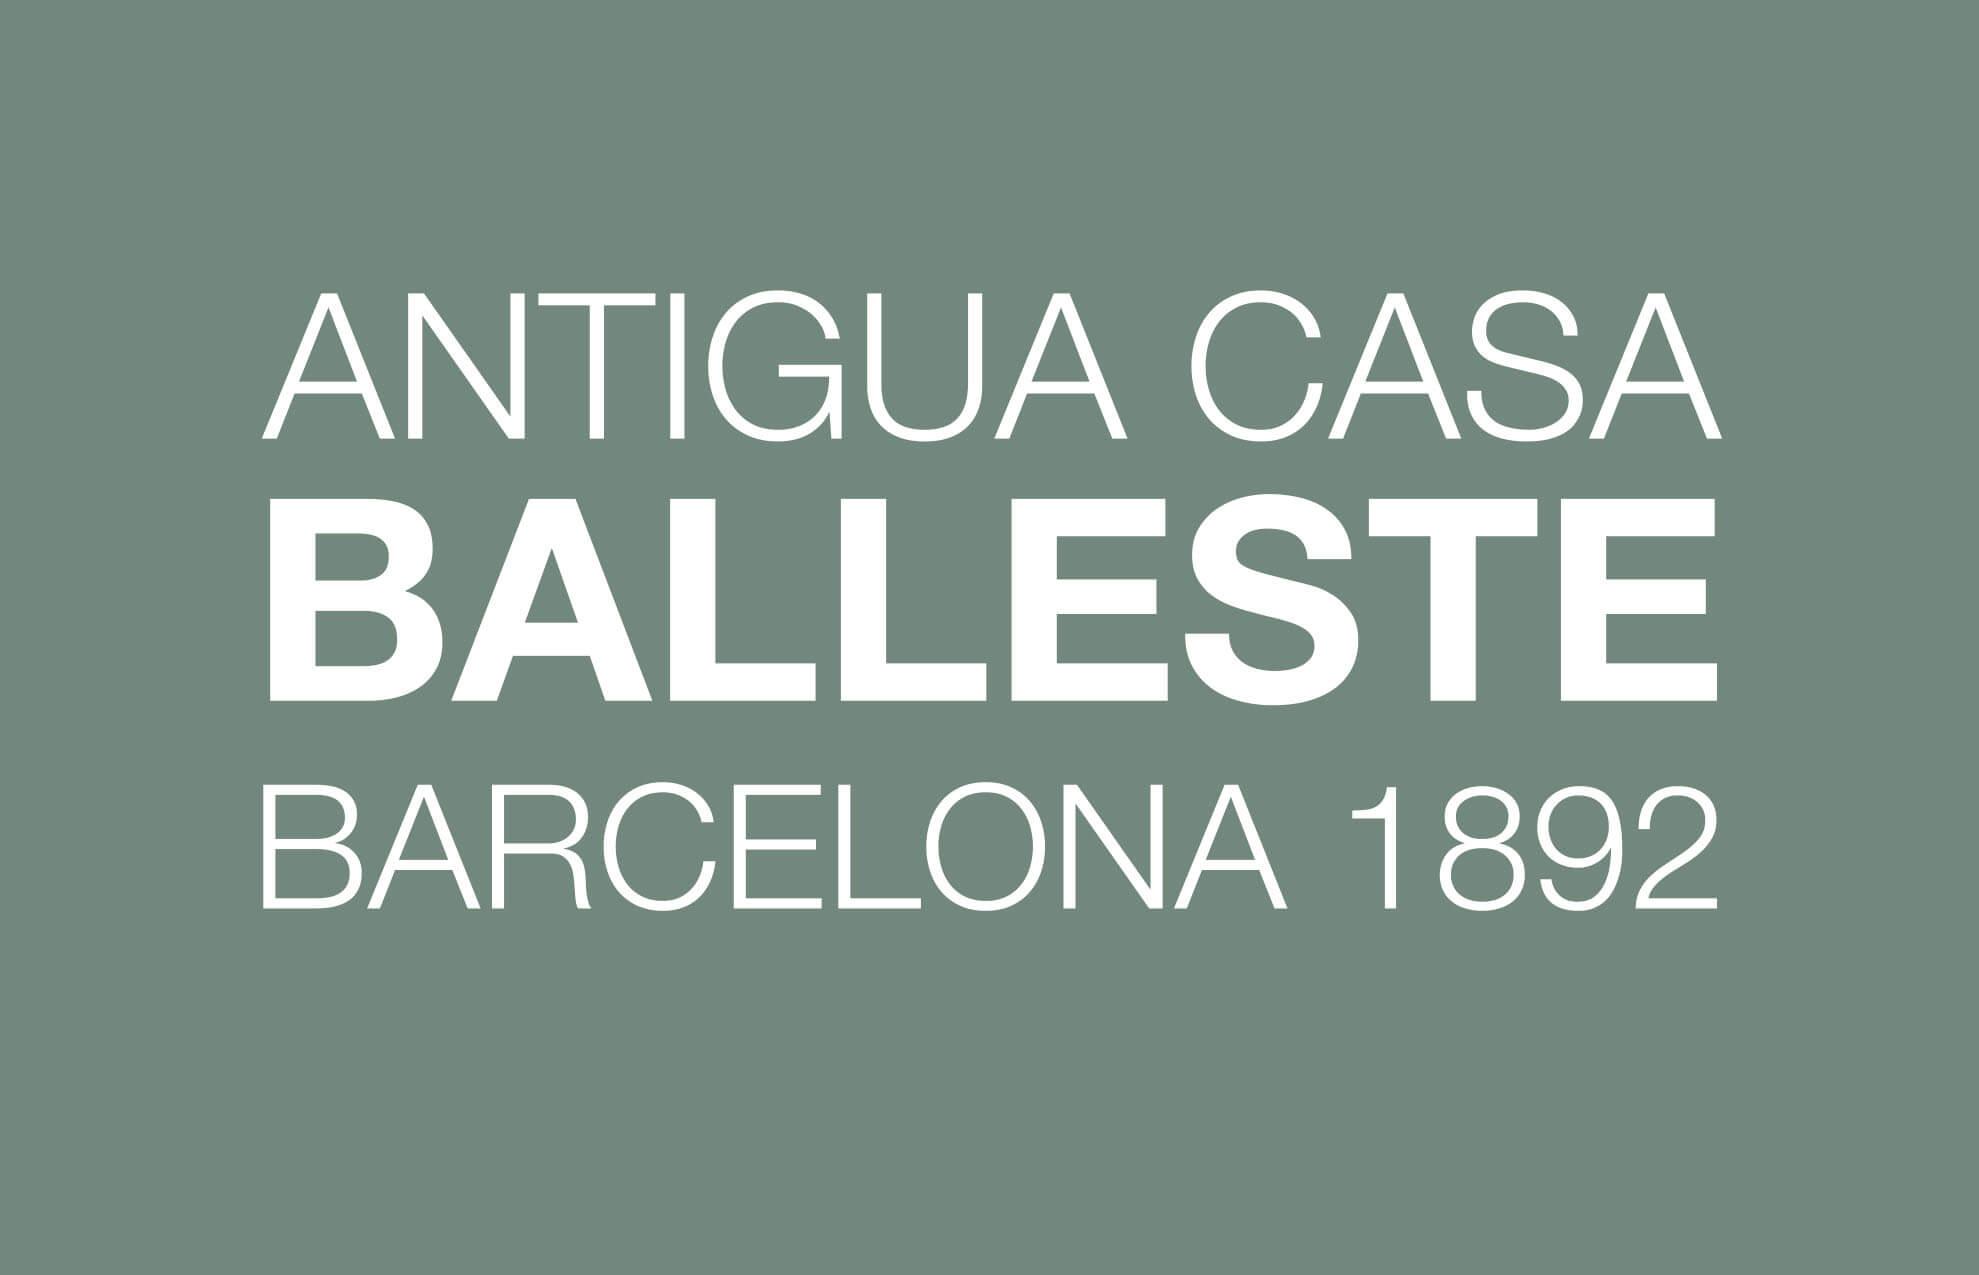 rediseno logotipo casa balleste barcelona1 - Restyling. Branding. Moda